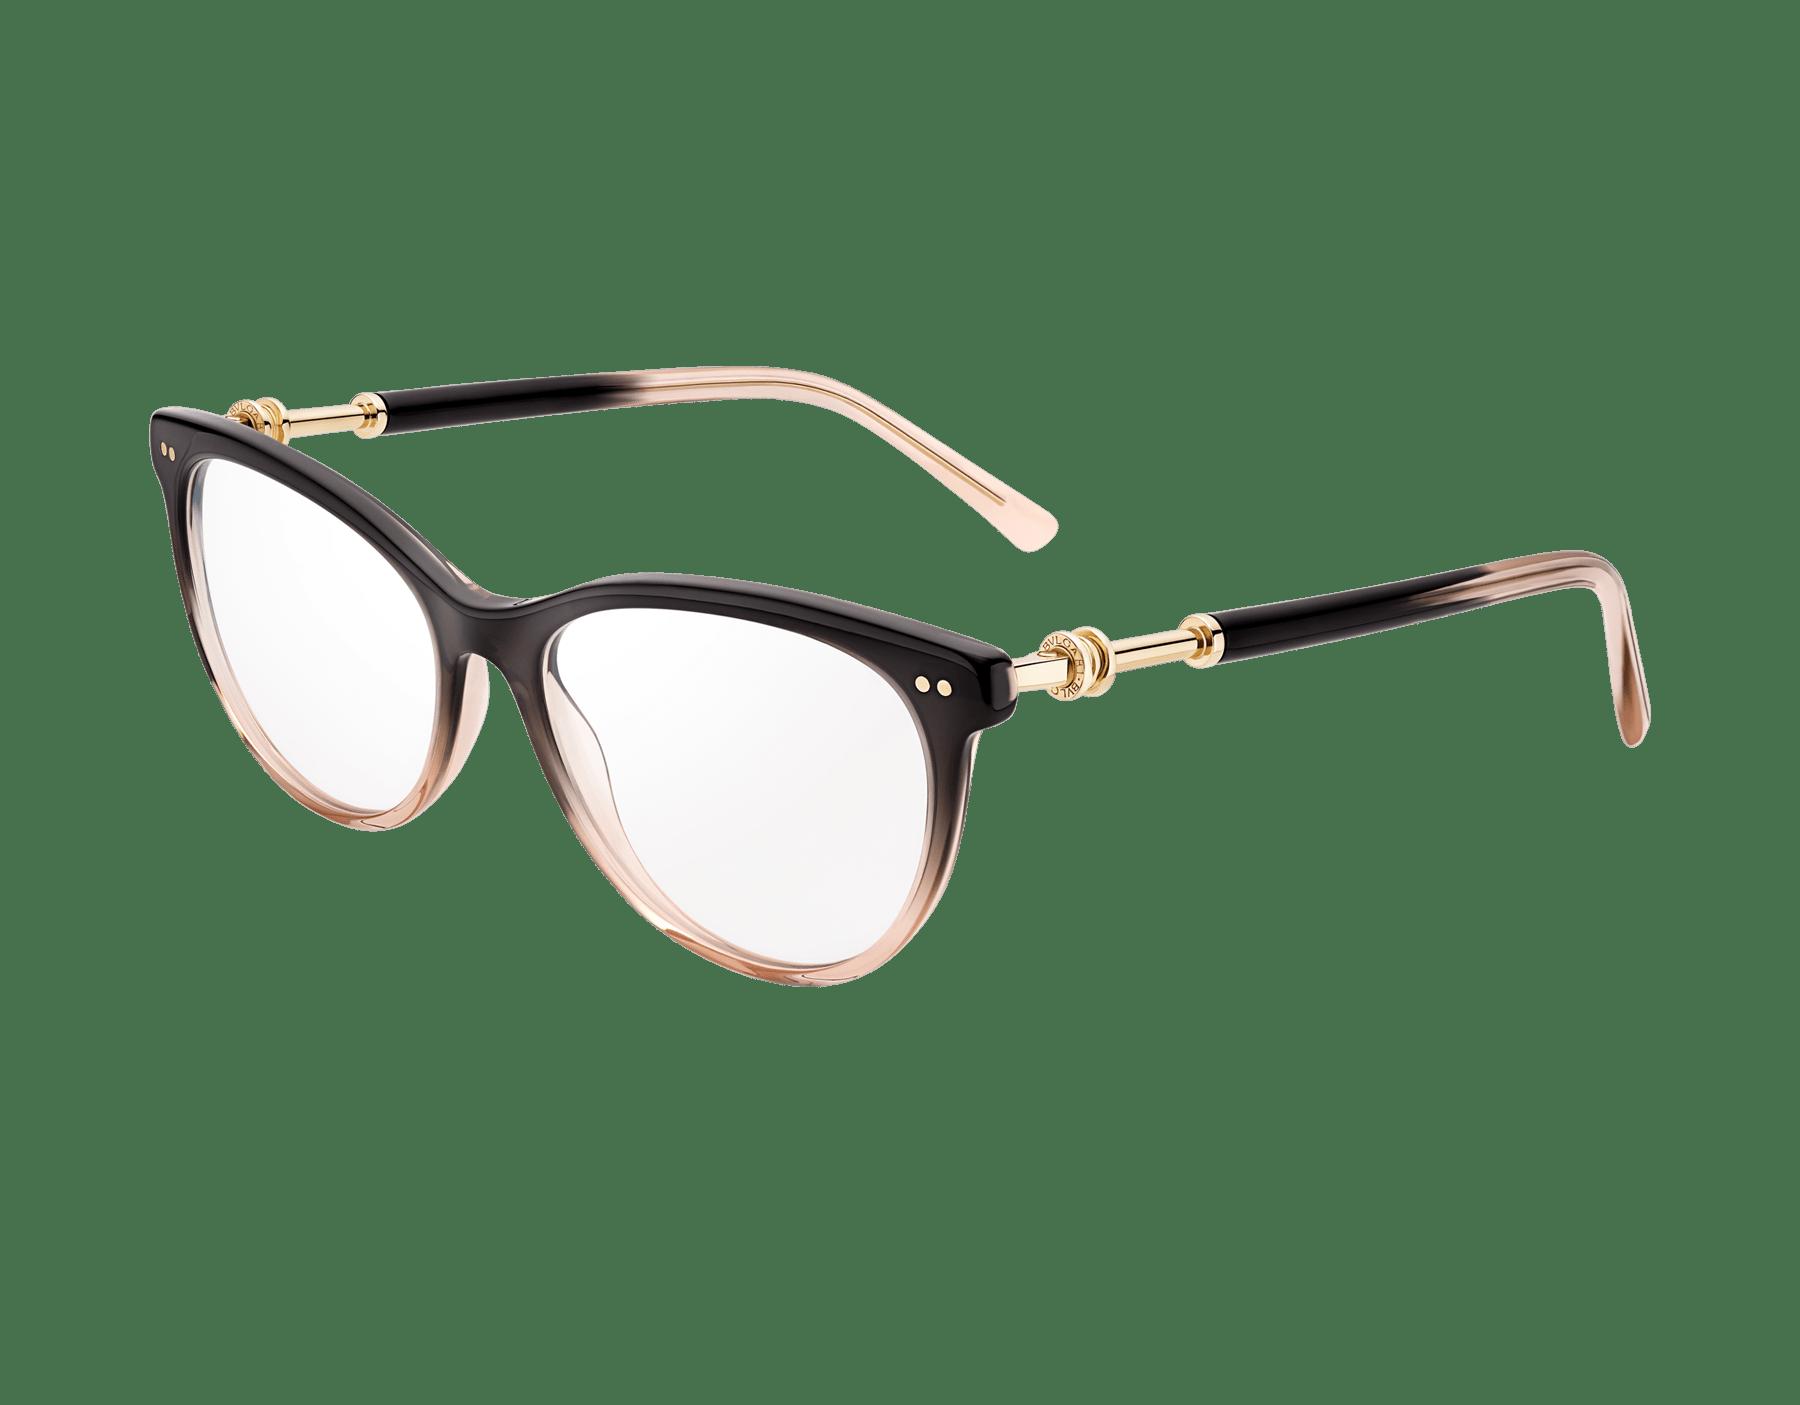 Bvlgari B.zero1 圓形貓眼醋酸纖維光學鏡架,飾以金屬元素。 903809 image 1